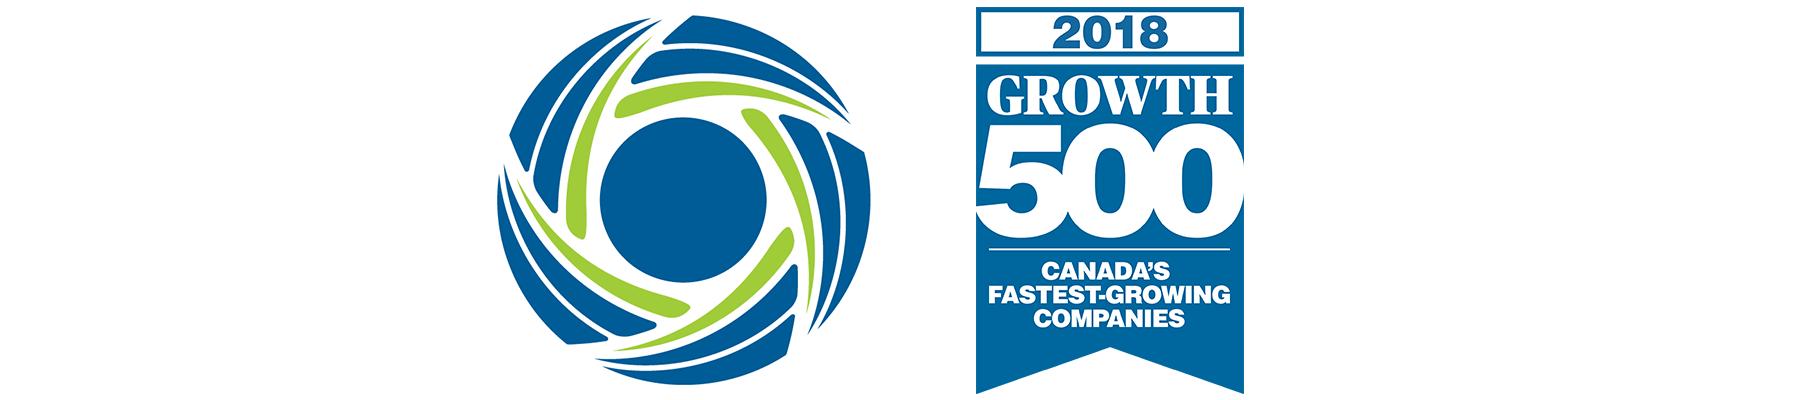 2018 Growth 500